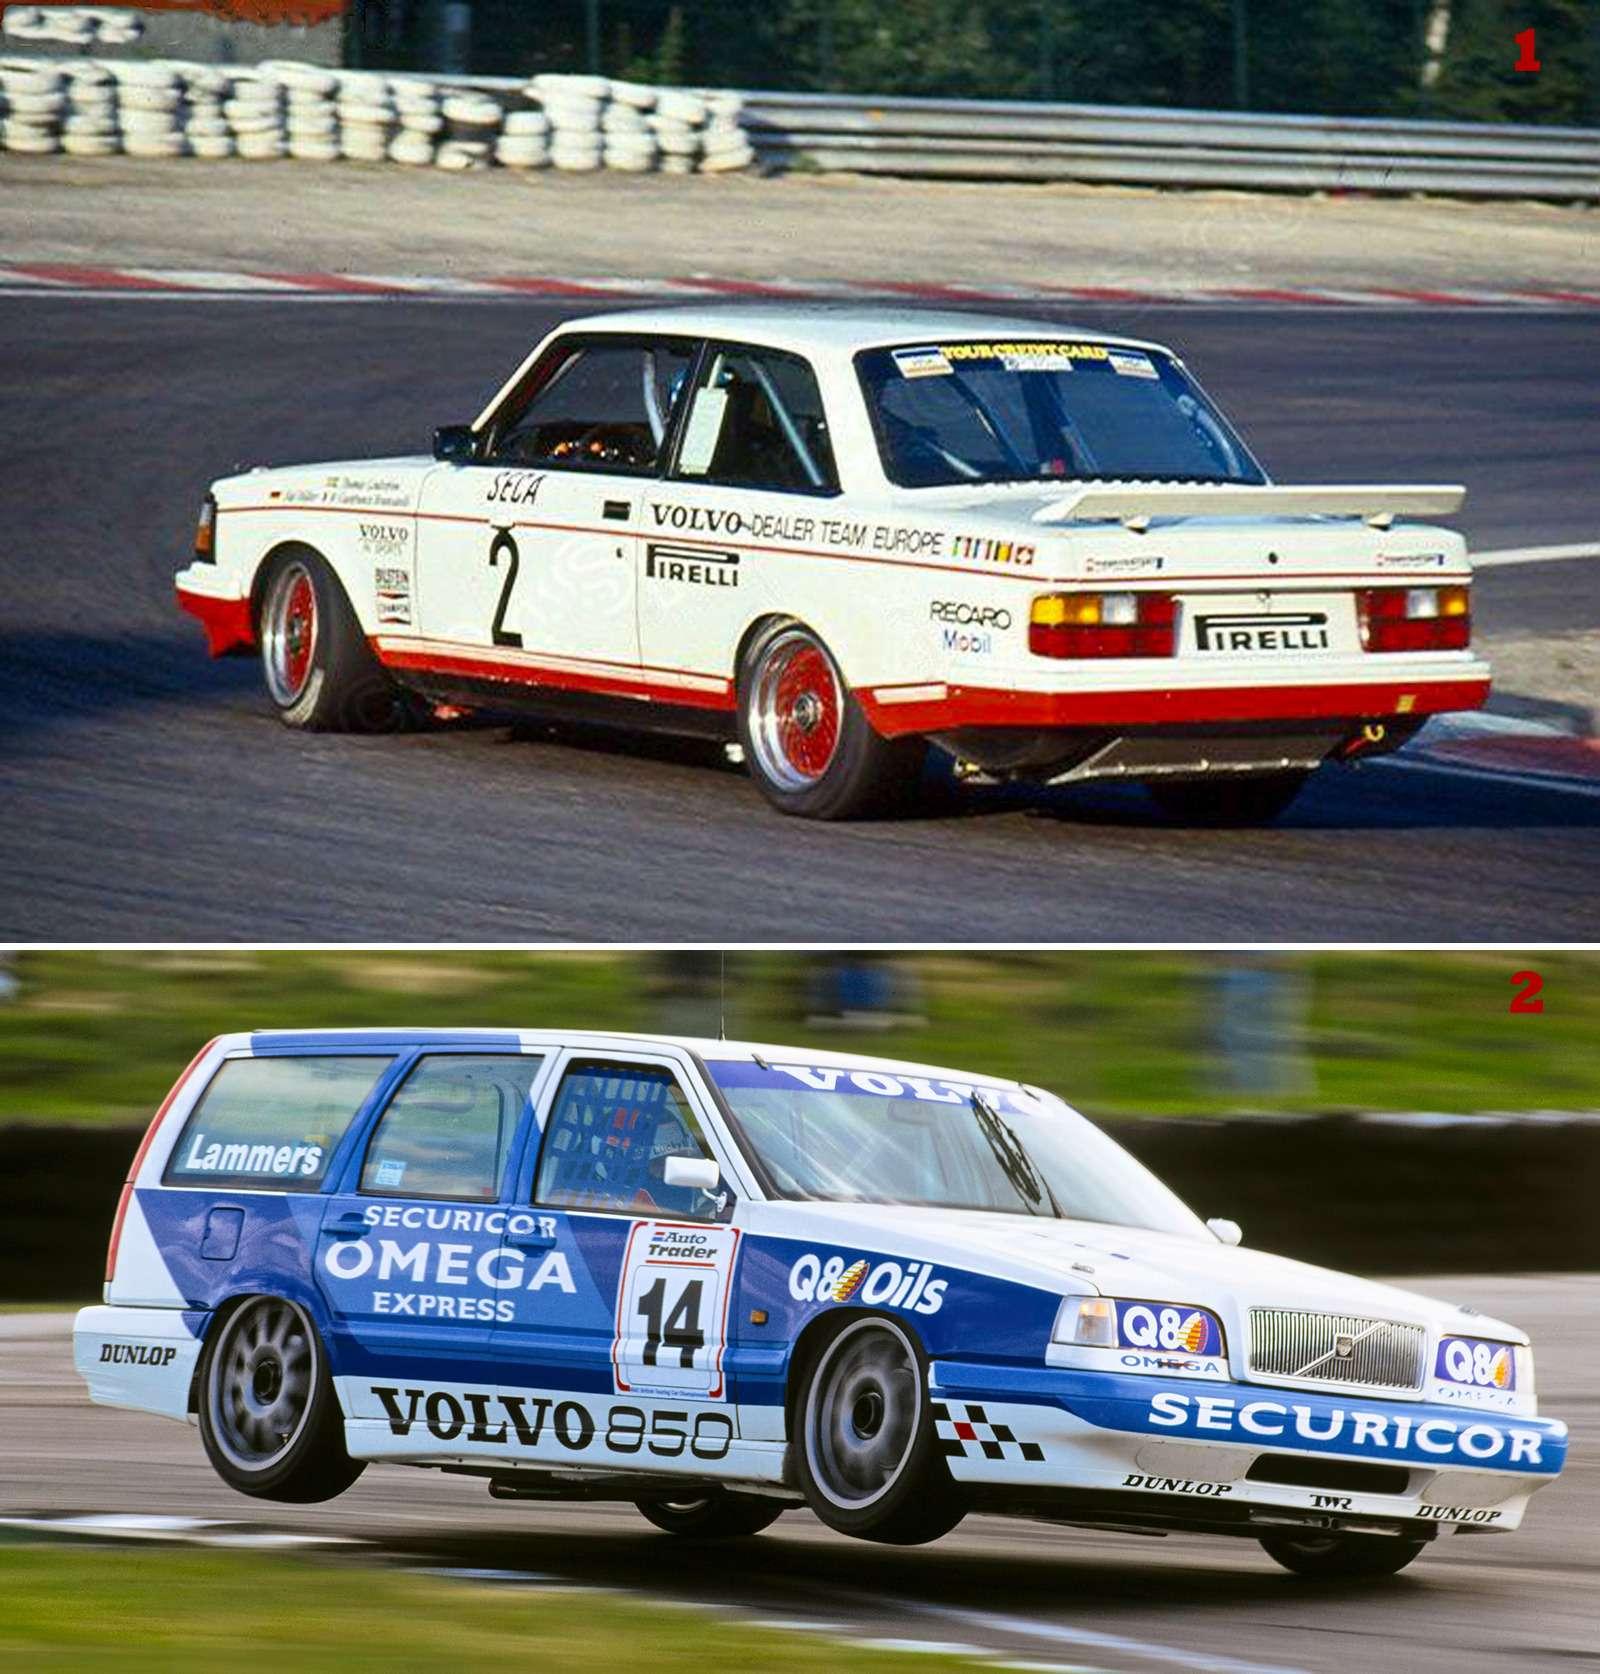 Volvo соспециями: дегустируем спортпакет Polestar— фото 586622